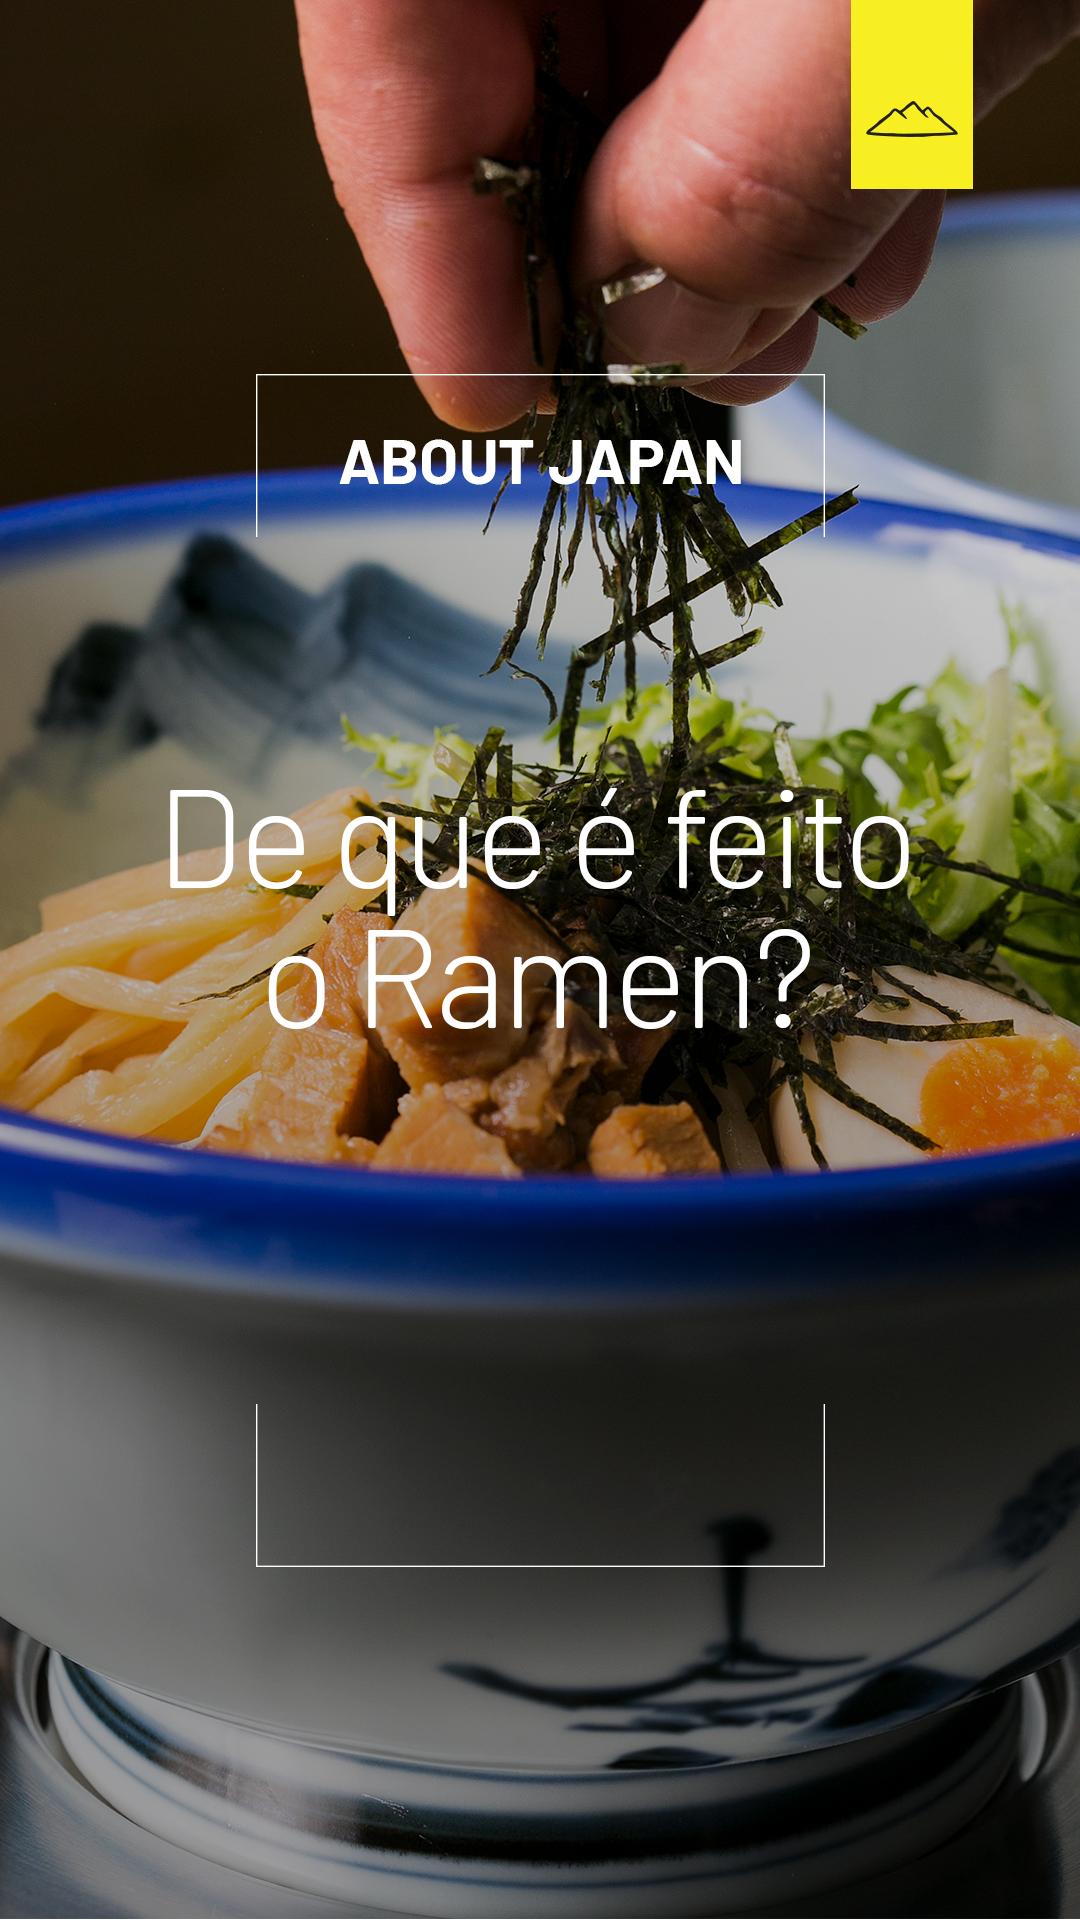 AFU_SM_PostStorie20_pergunta_AboutJapan_01S